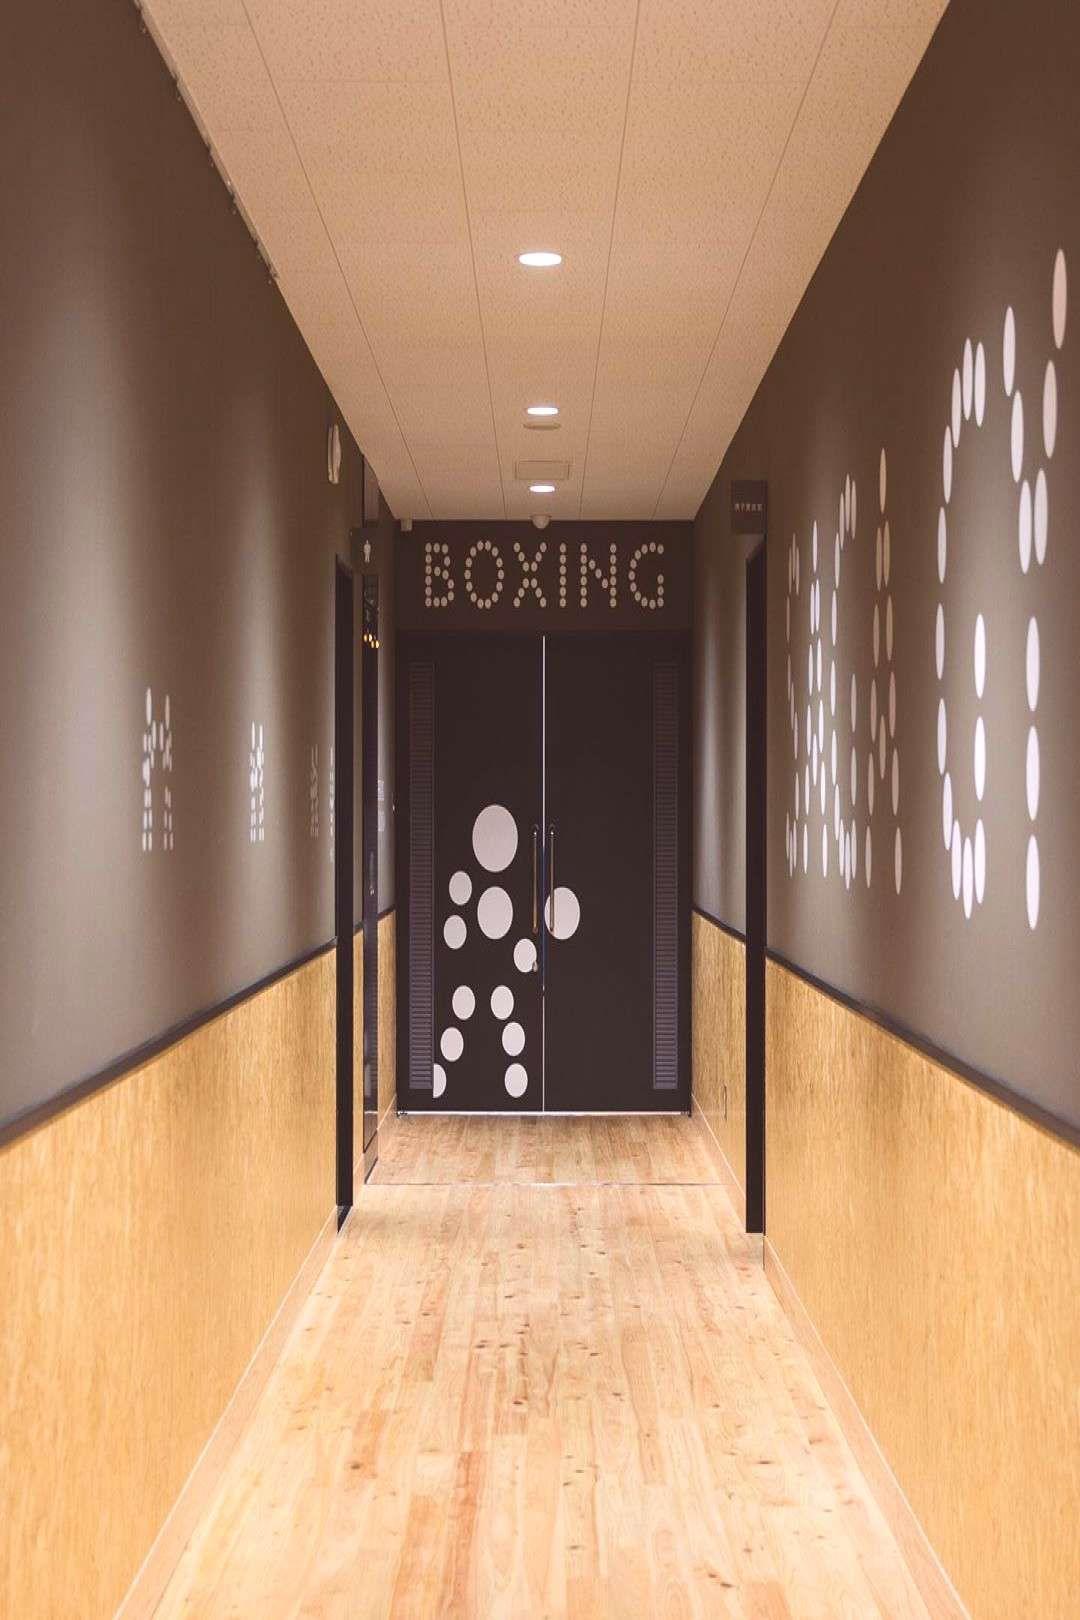 SAGA GYM boxingampfencing サイン計画 Architect. Open A AD. Yum